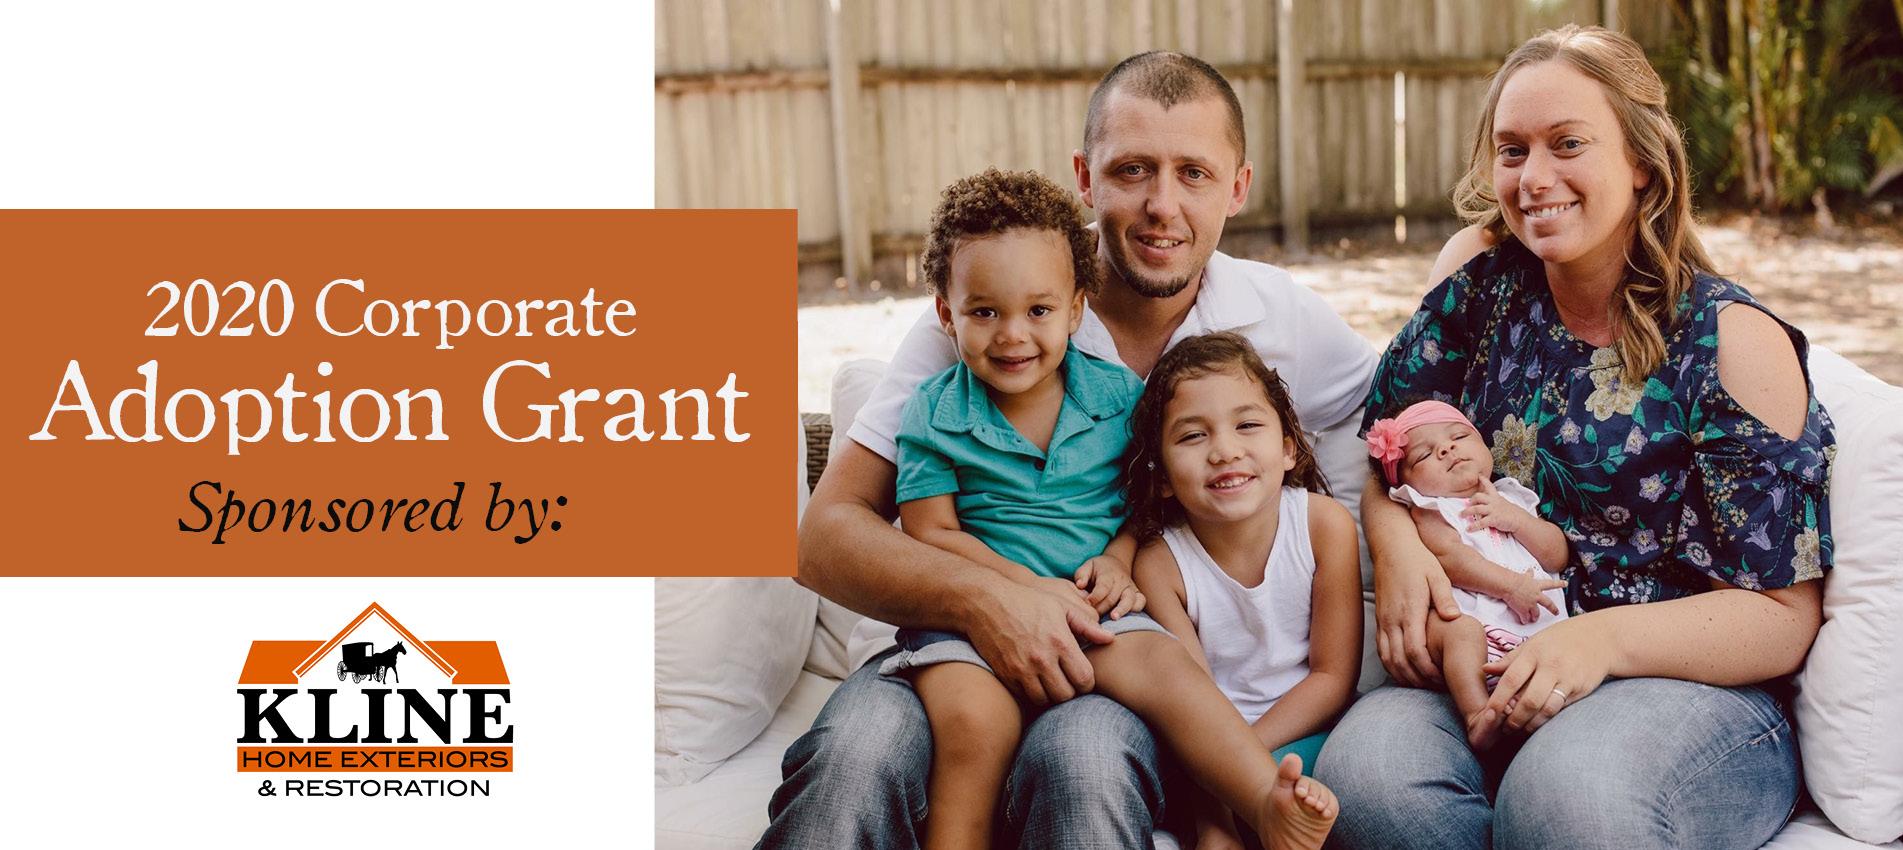 2020 Corporate Adoption Grant Sponsored by Kline Home Exteriors